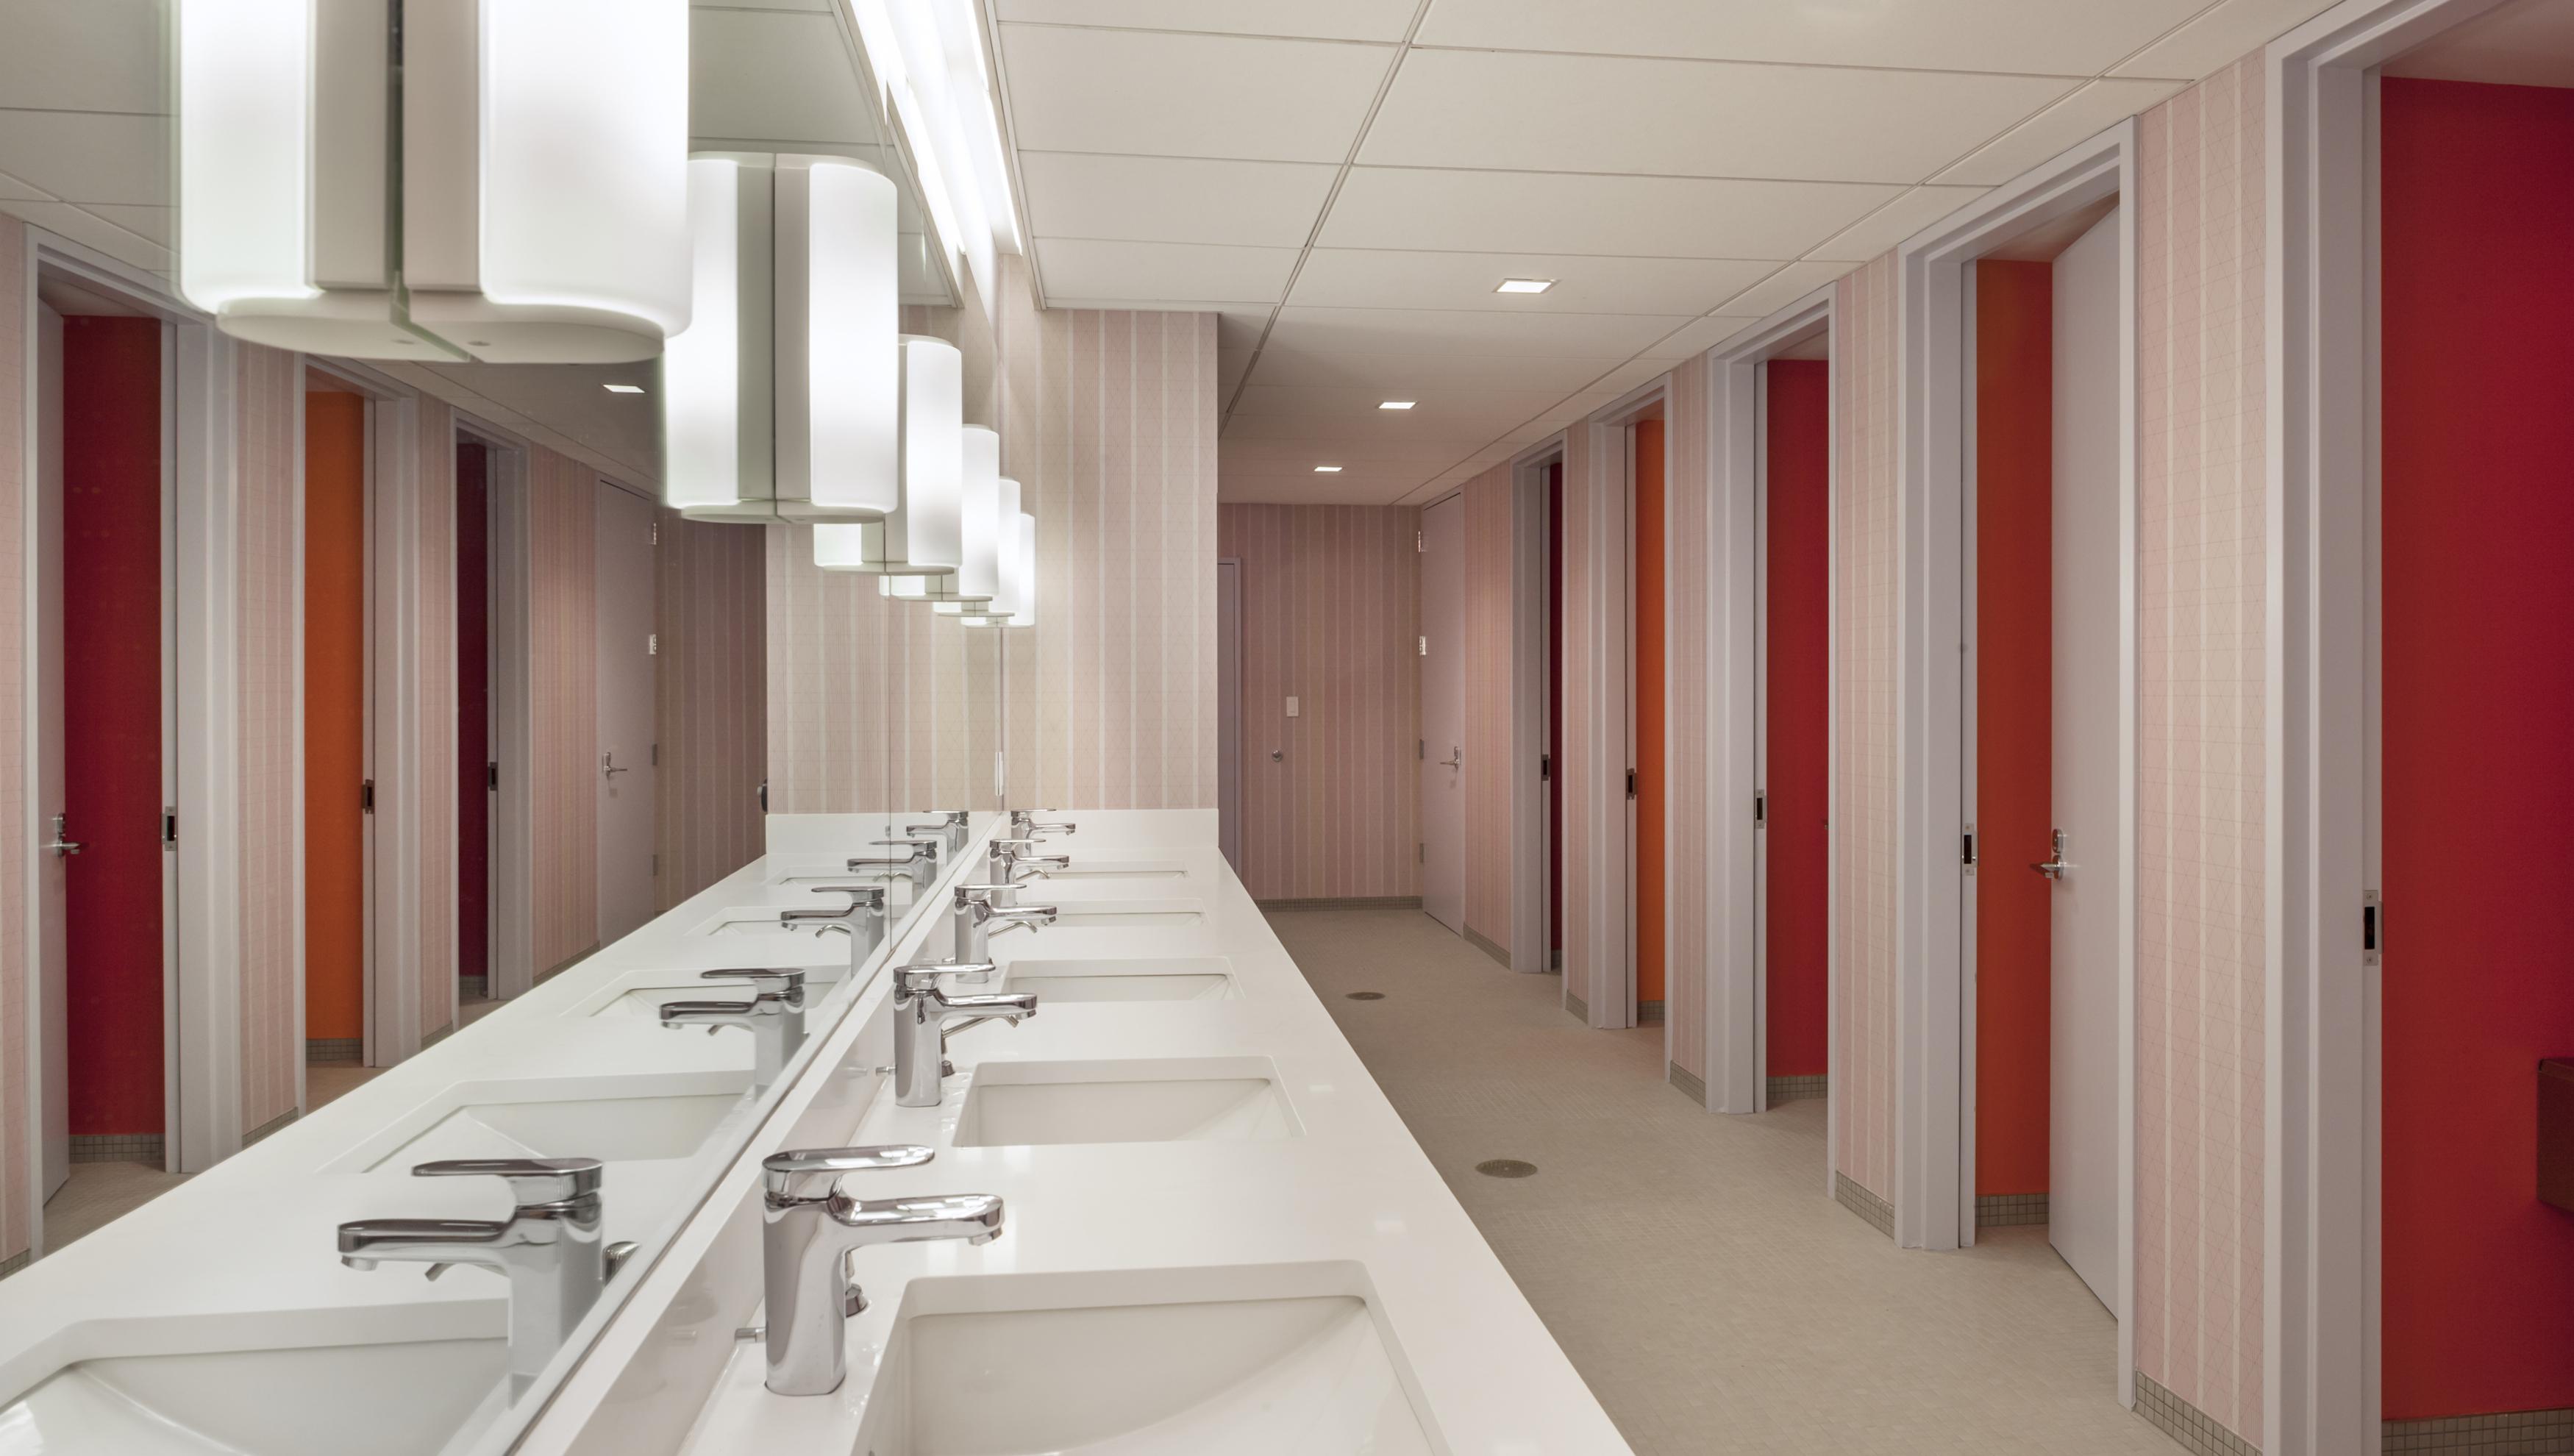 how to design transgender friendly bathrooms that make gender inclusive individual bathrooms Gender -Neutral Bathroom